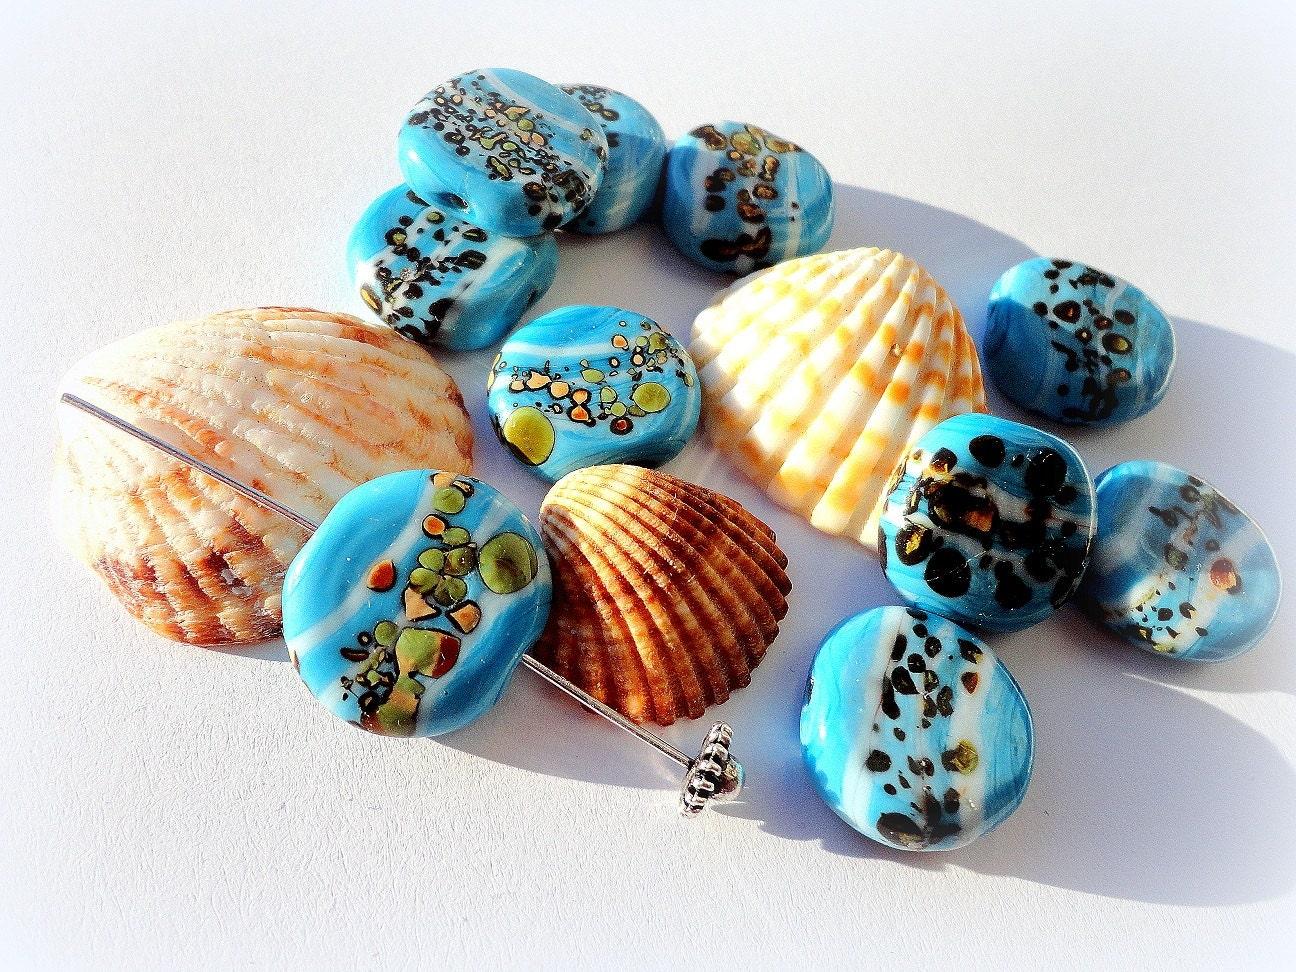 Lampwork Beads, Lampwork Lentil Beads, 20 x 18 mm Lampwork Beads, 4 pcs. - KristinesBeads